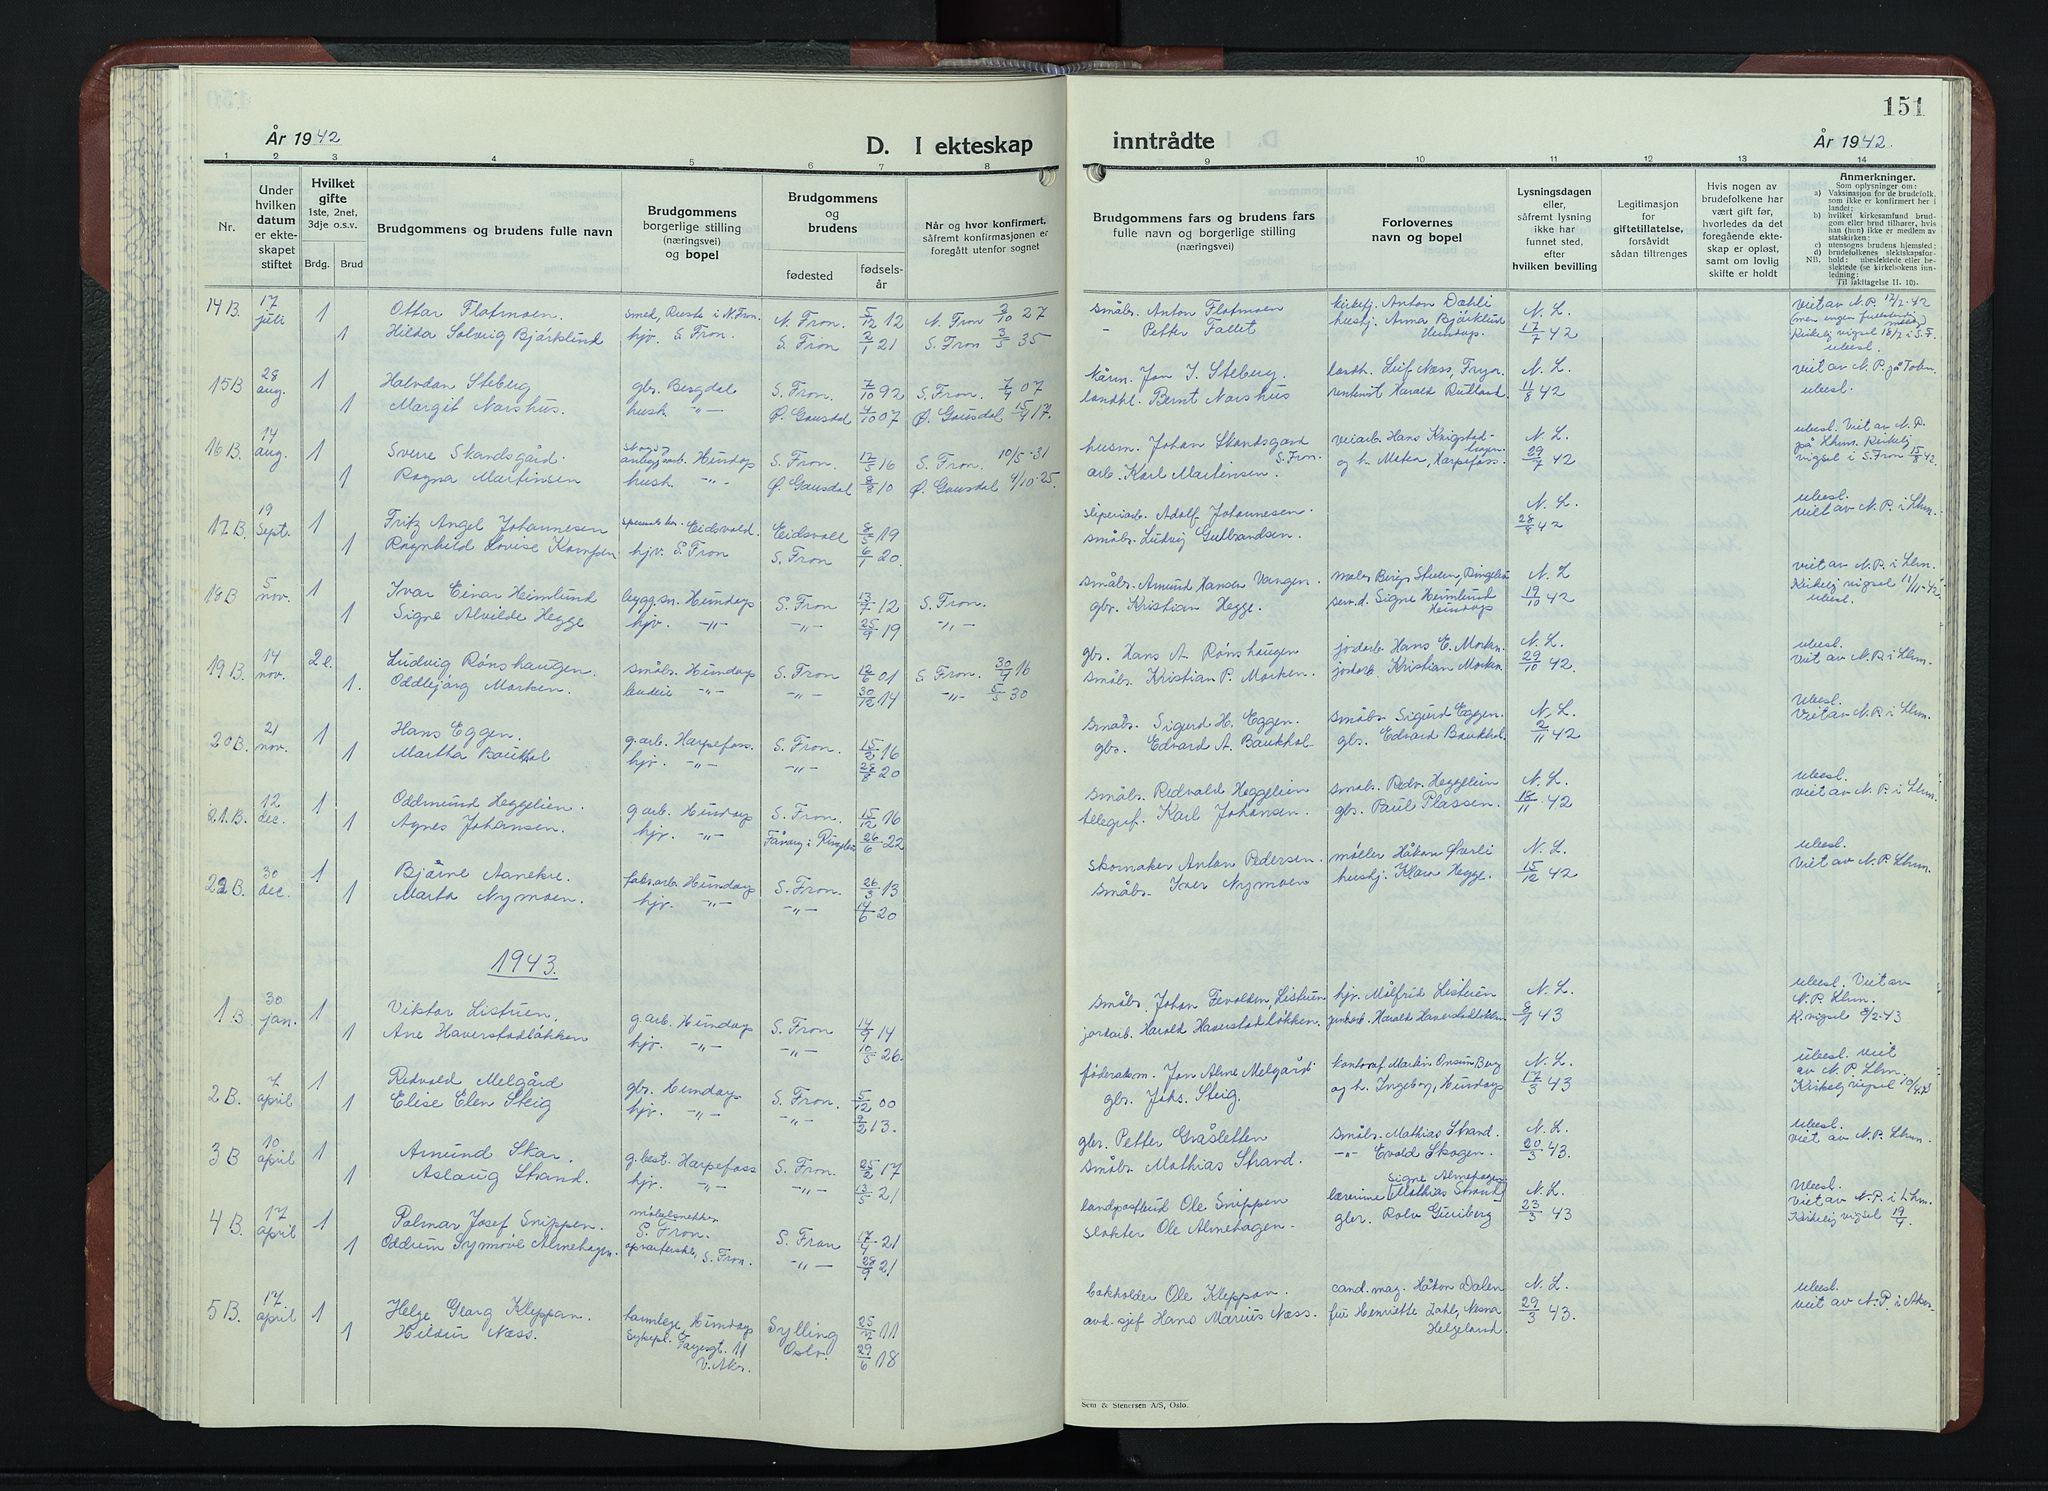 SAH, Sør-Fron prestekontor, H/Ha/Hab/L0006: Klokkerbok nr. 6, 1933-1948, s. 151